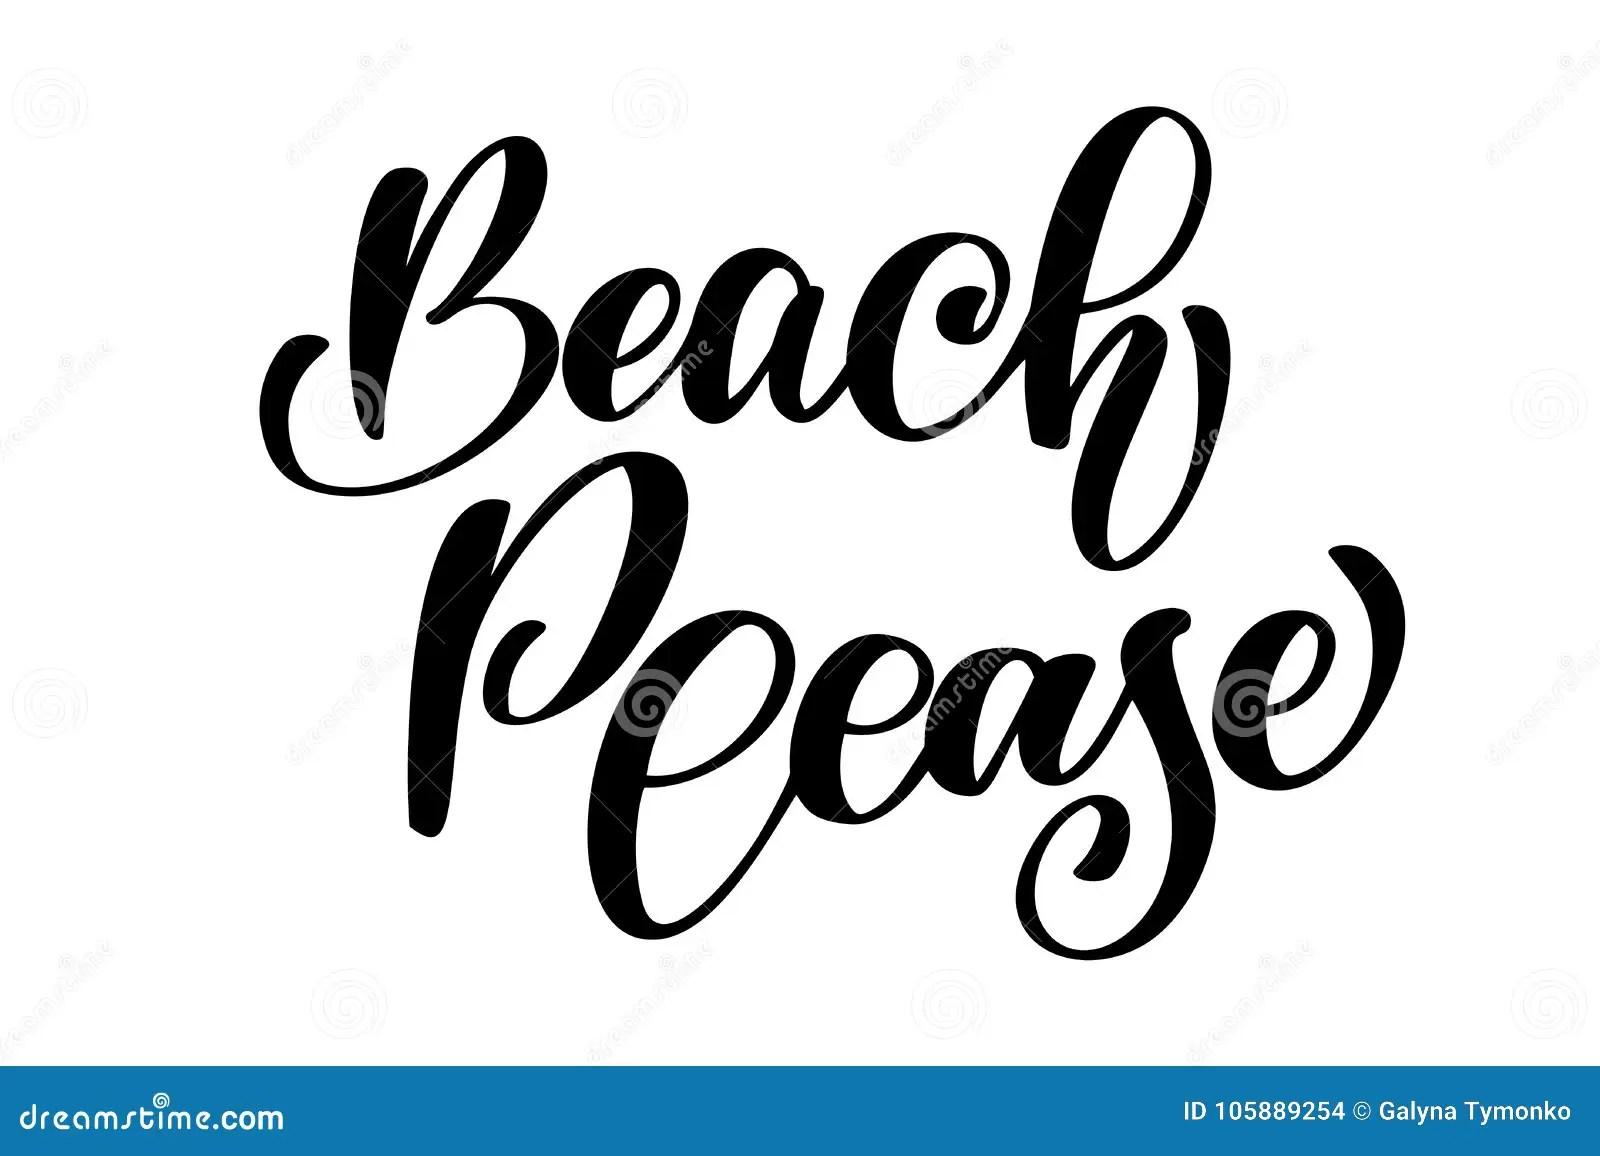 Beach Please Text Hand Drawn Summer Lettering Handwritten